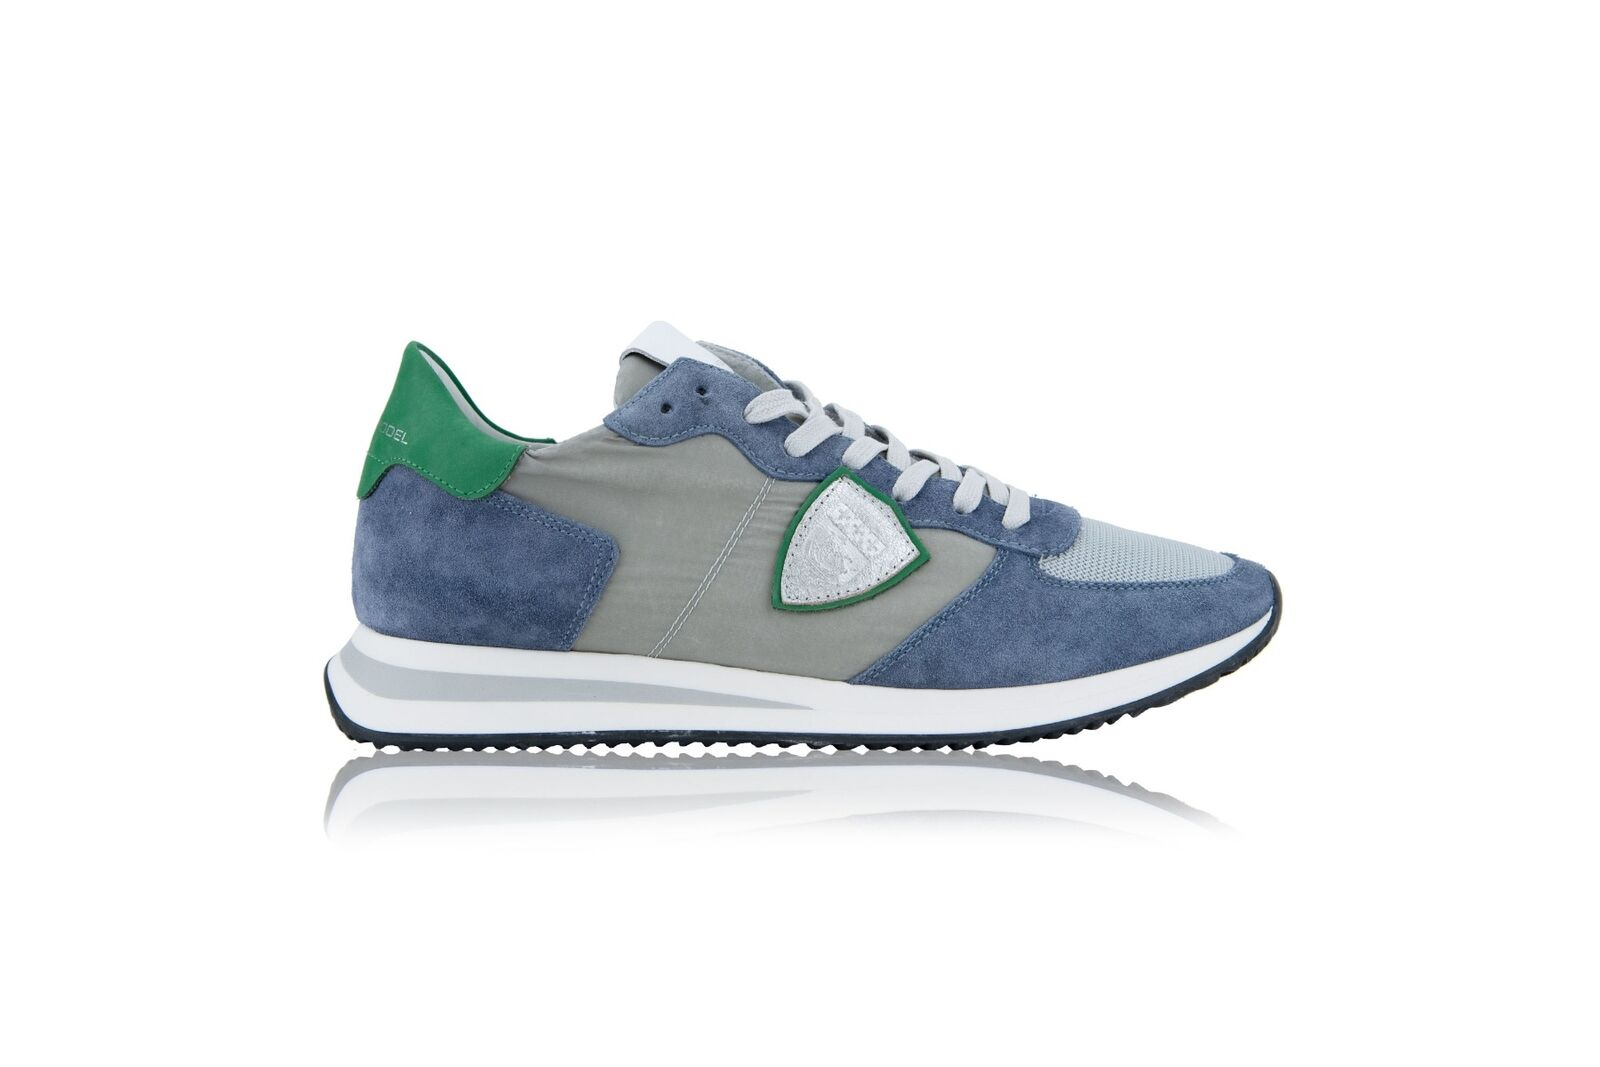 PHILIPPE MODEL Trpx W038 Sneakers Men's Shoes S1.SC025